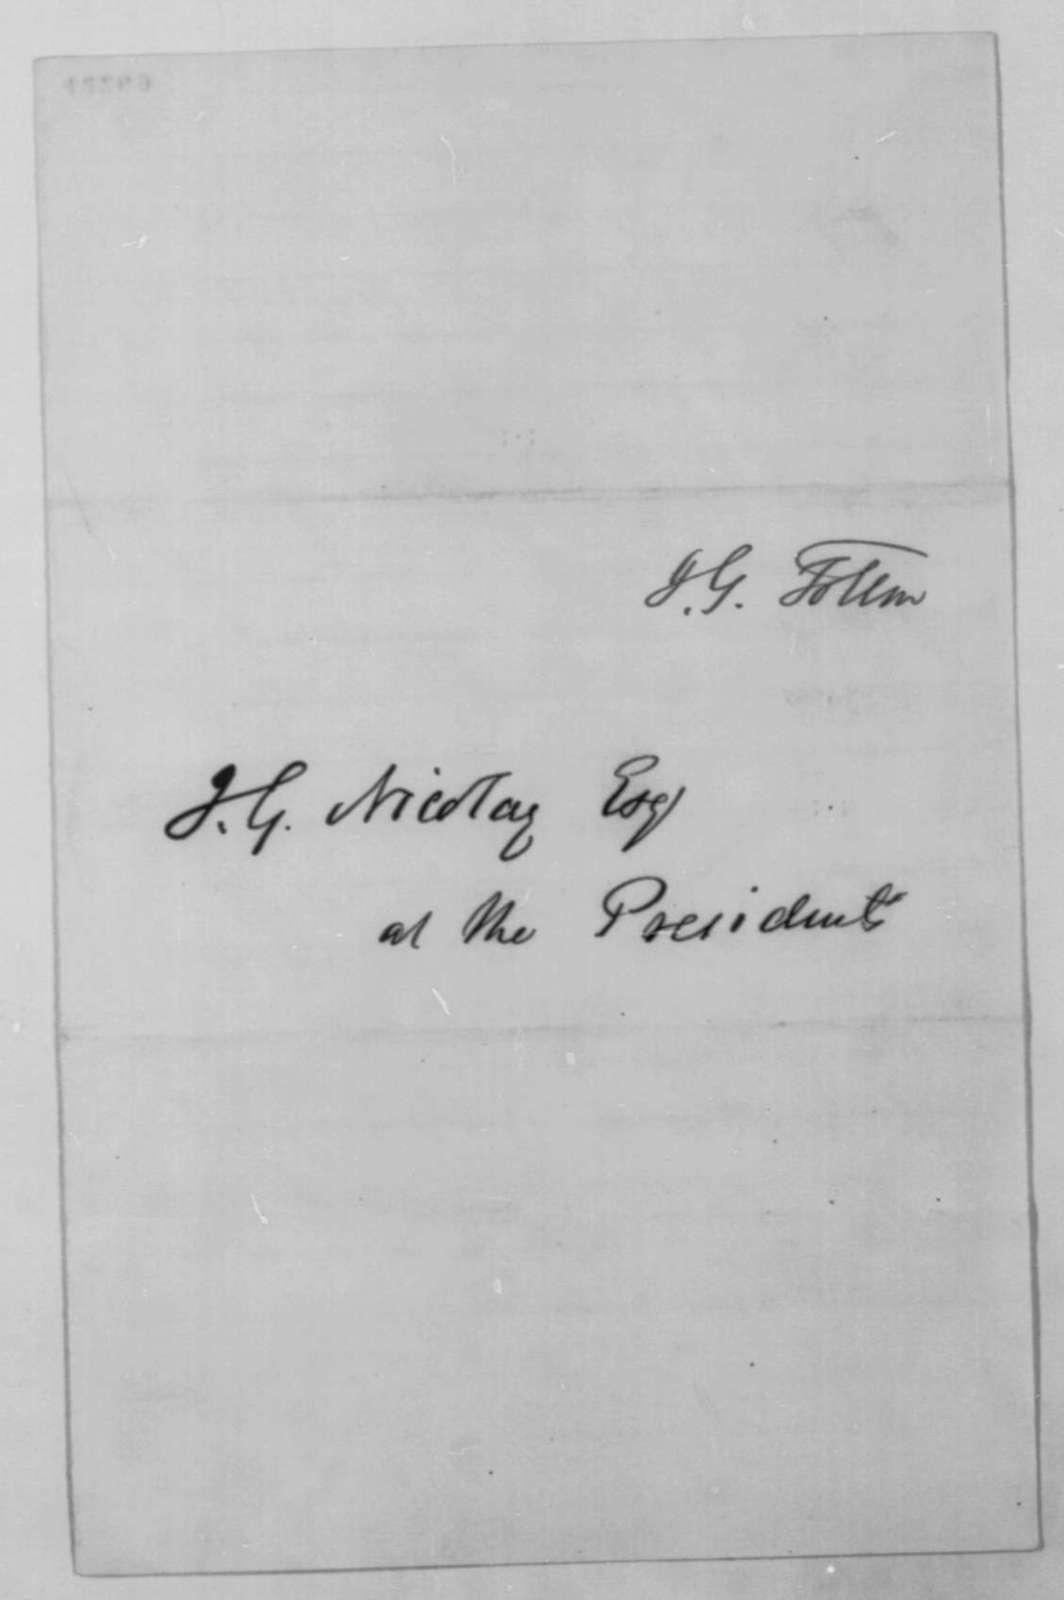 Joseph G. Totten to John G. Nicolay, Thursday, May 22, 1862  (Cover letter)